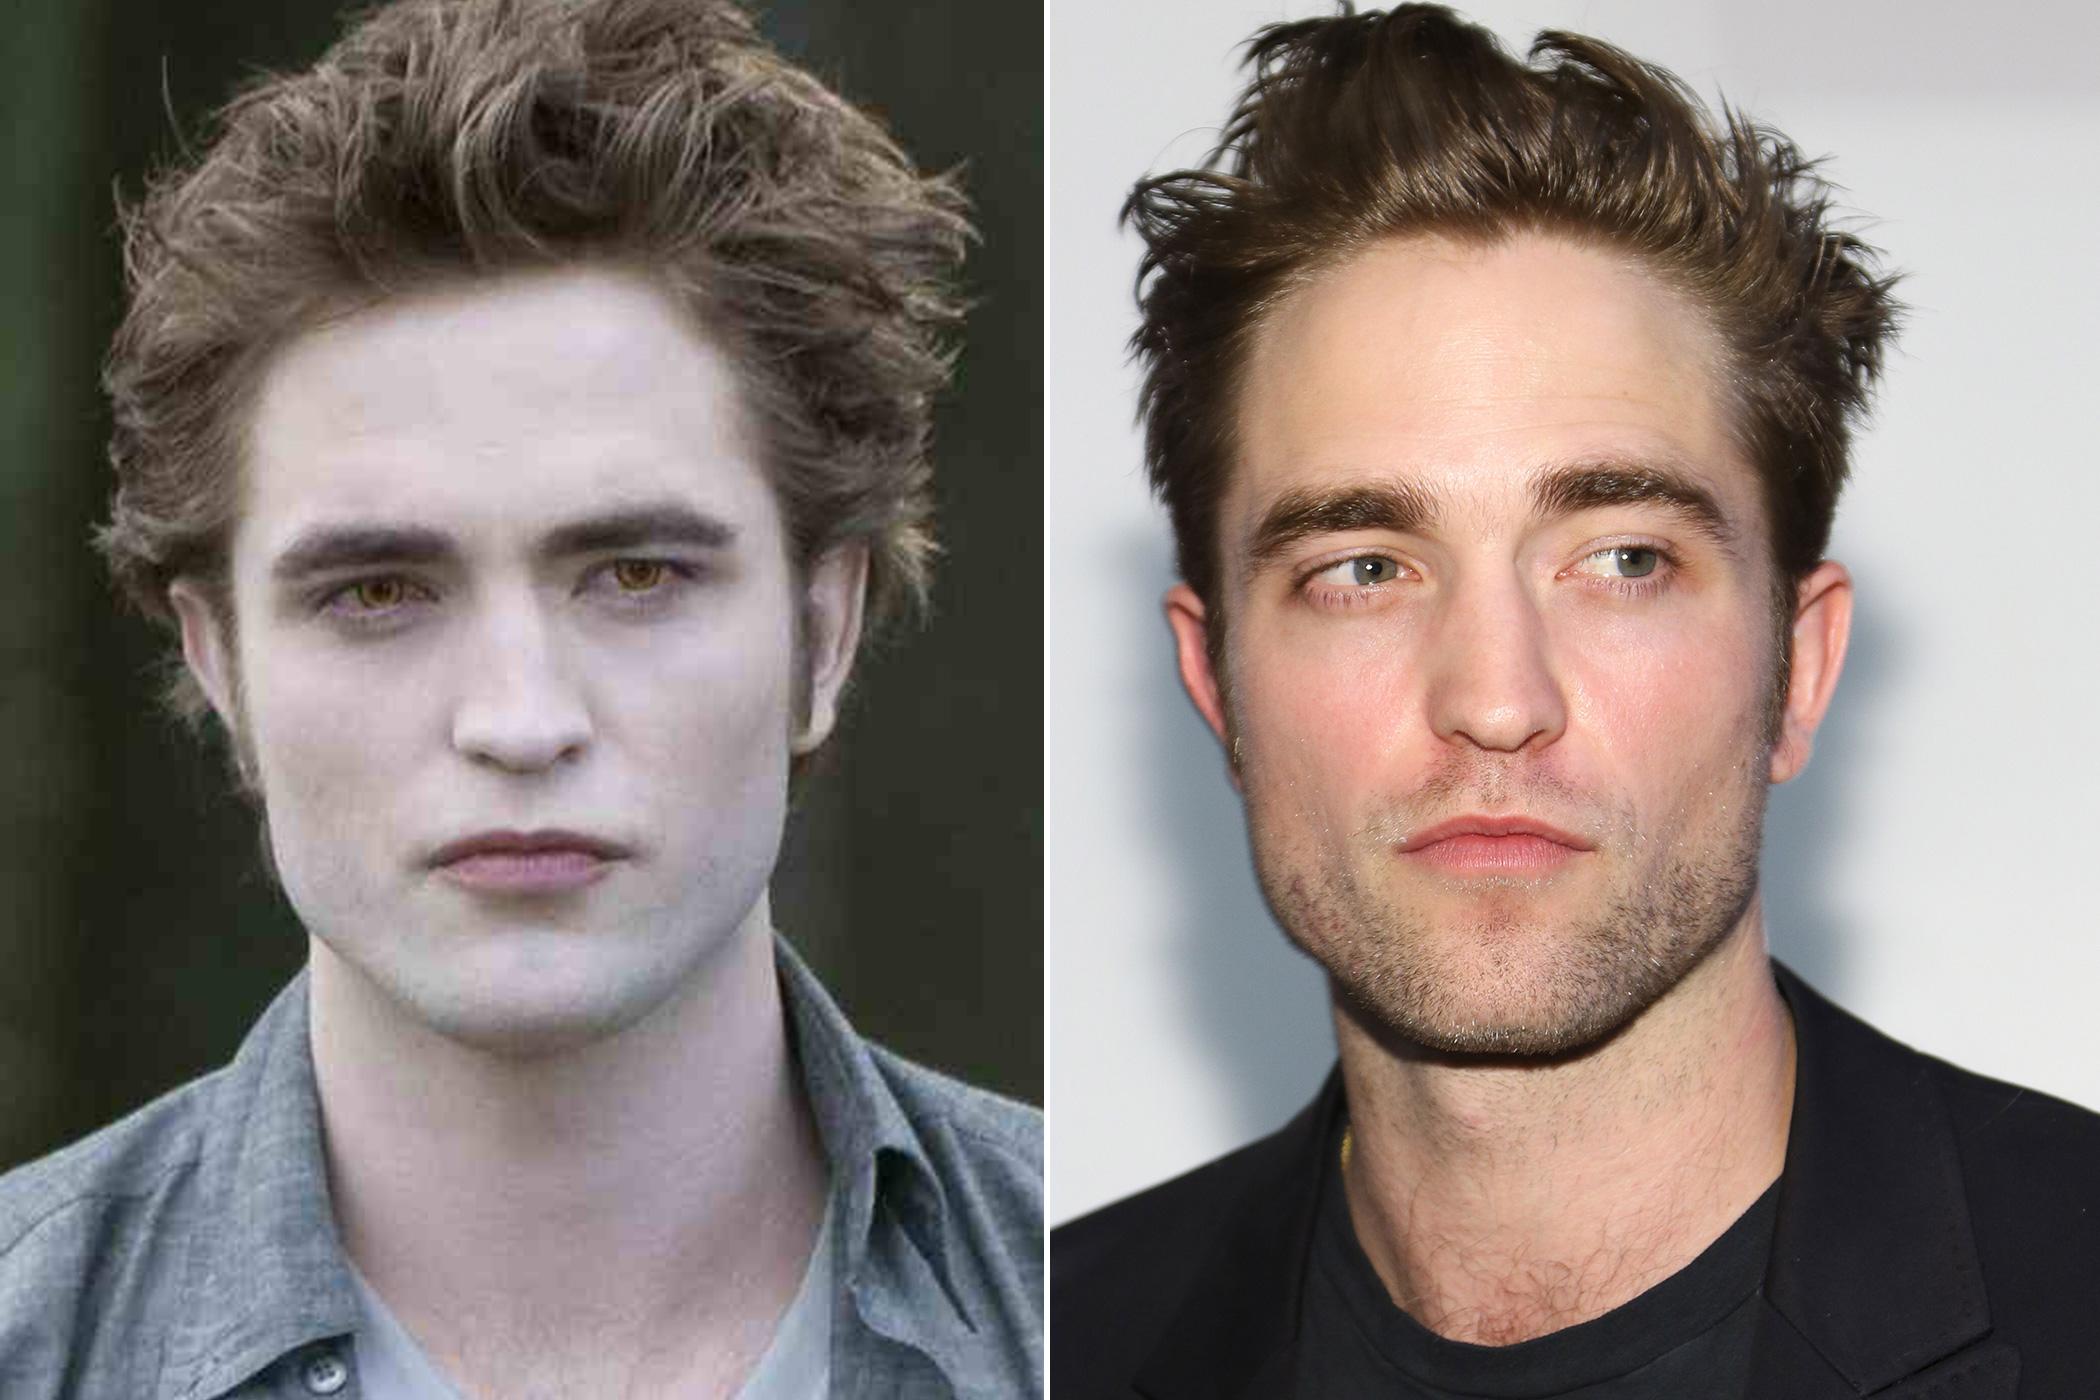 <i>Left</I>: Robert Pattinson as Edward Cullen in <i>Twilight: The New Moon</i>, 2009; <i>Right</i>: in 2015